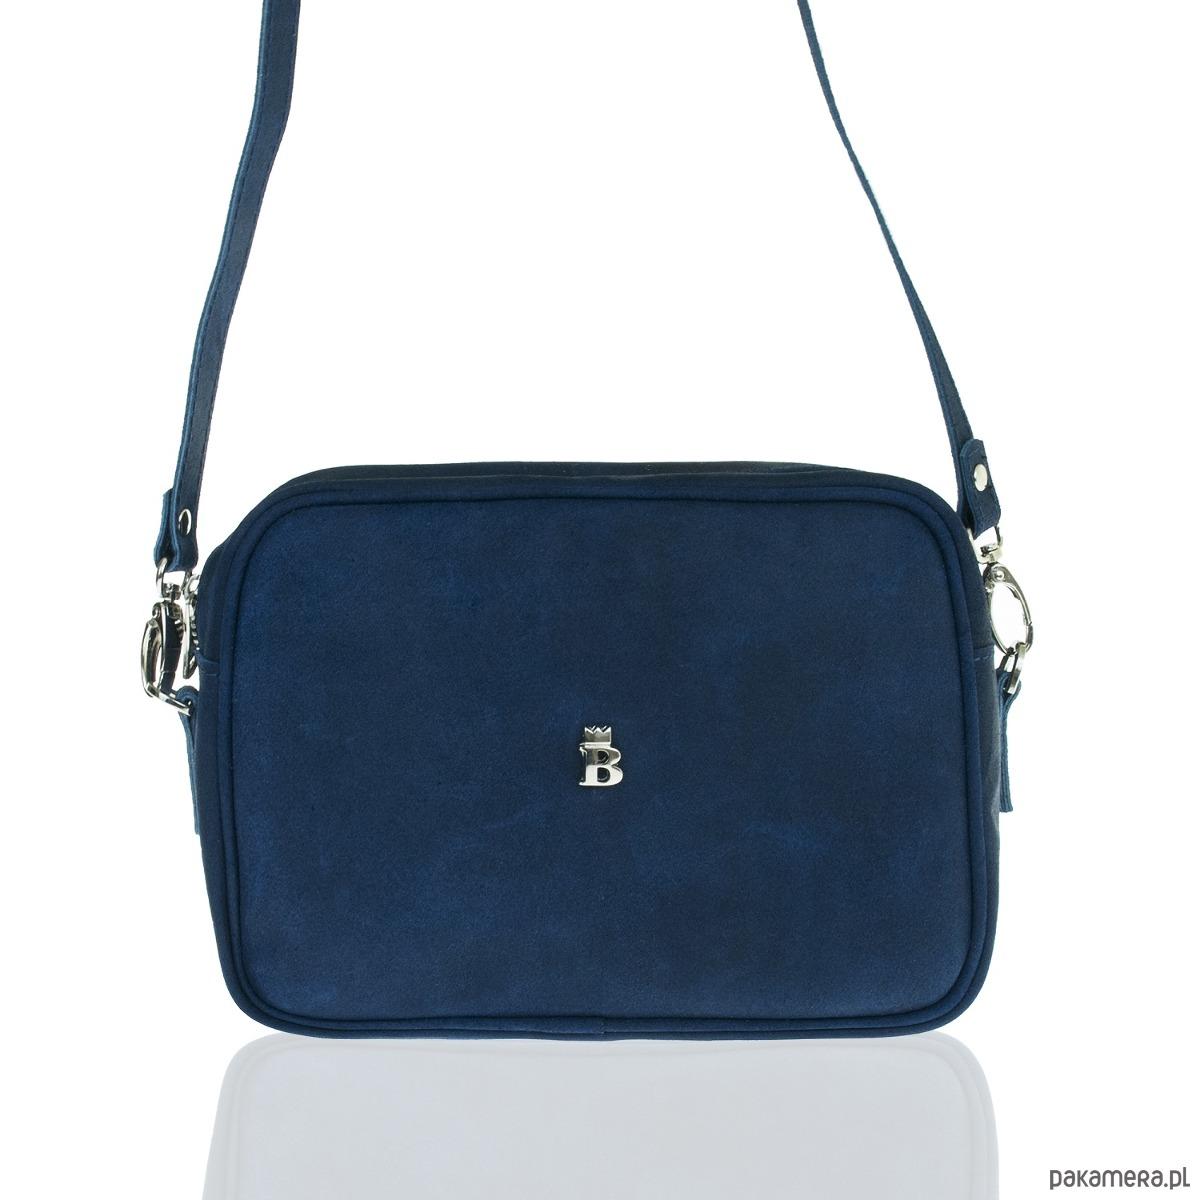 a042399999ed1 Mała damska torebka miejska na ramię ze skóry - torebki mini ...